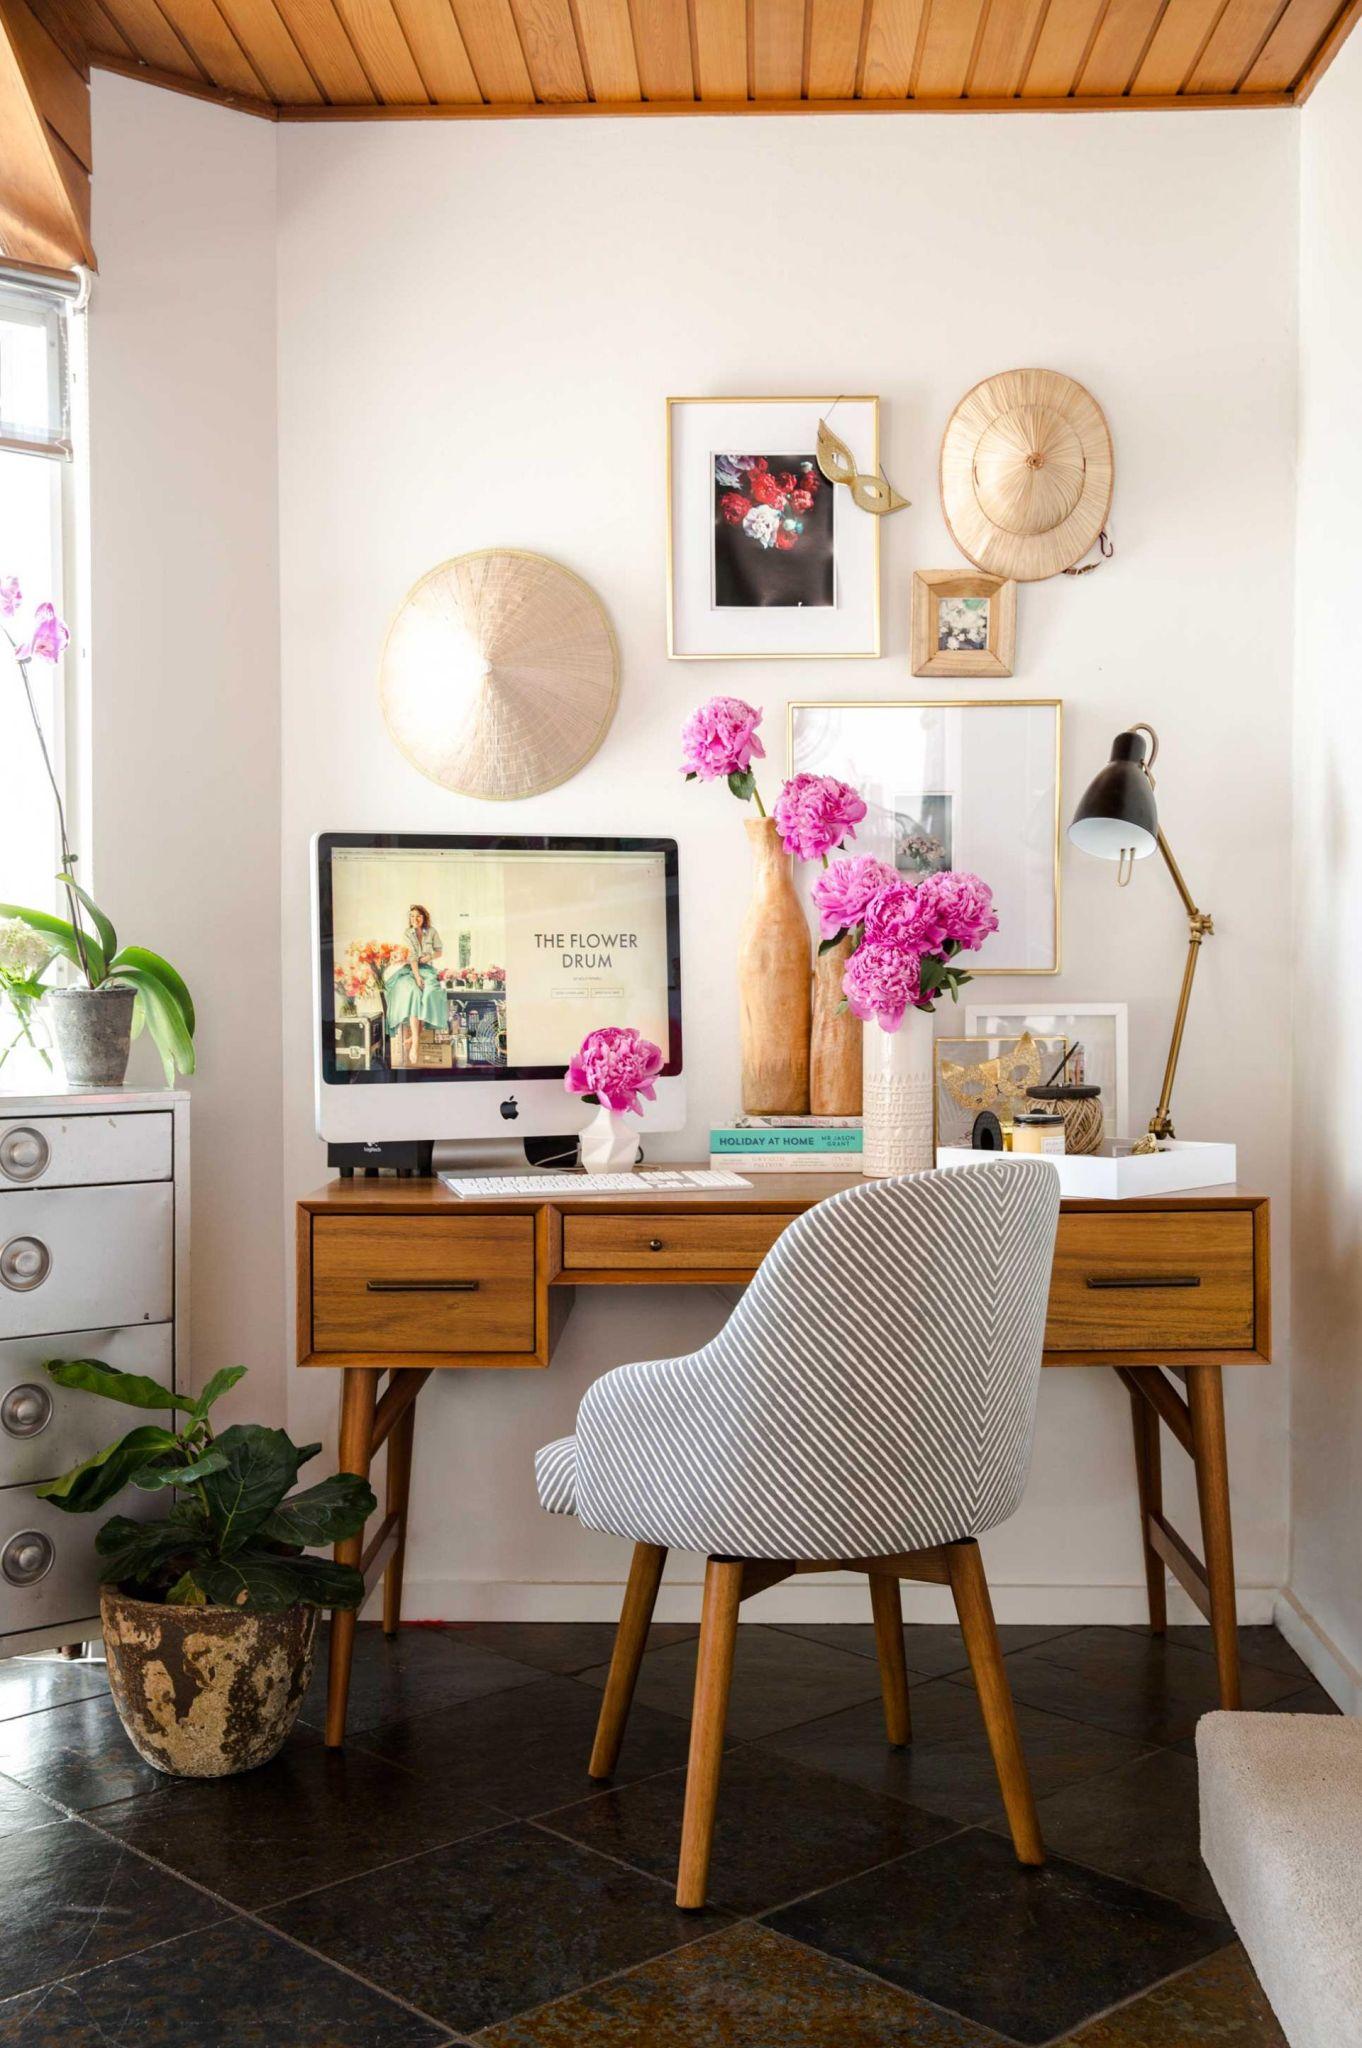 29-fabulous-florals-home-office-ideas-homebnc-681x1024@2x.jpg